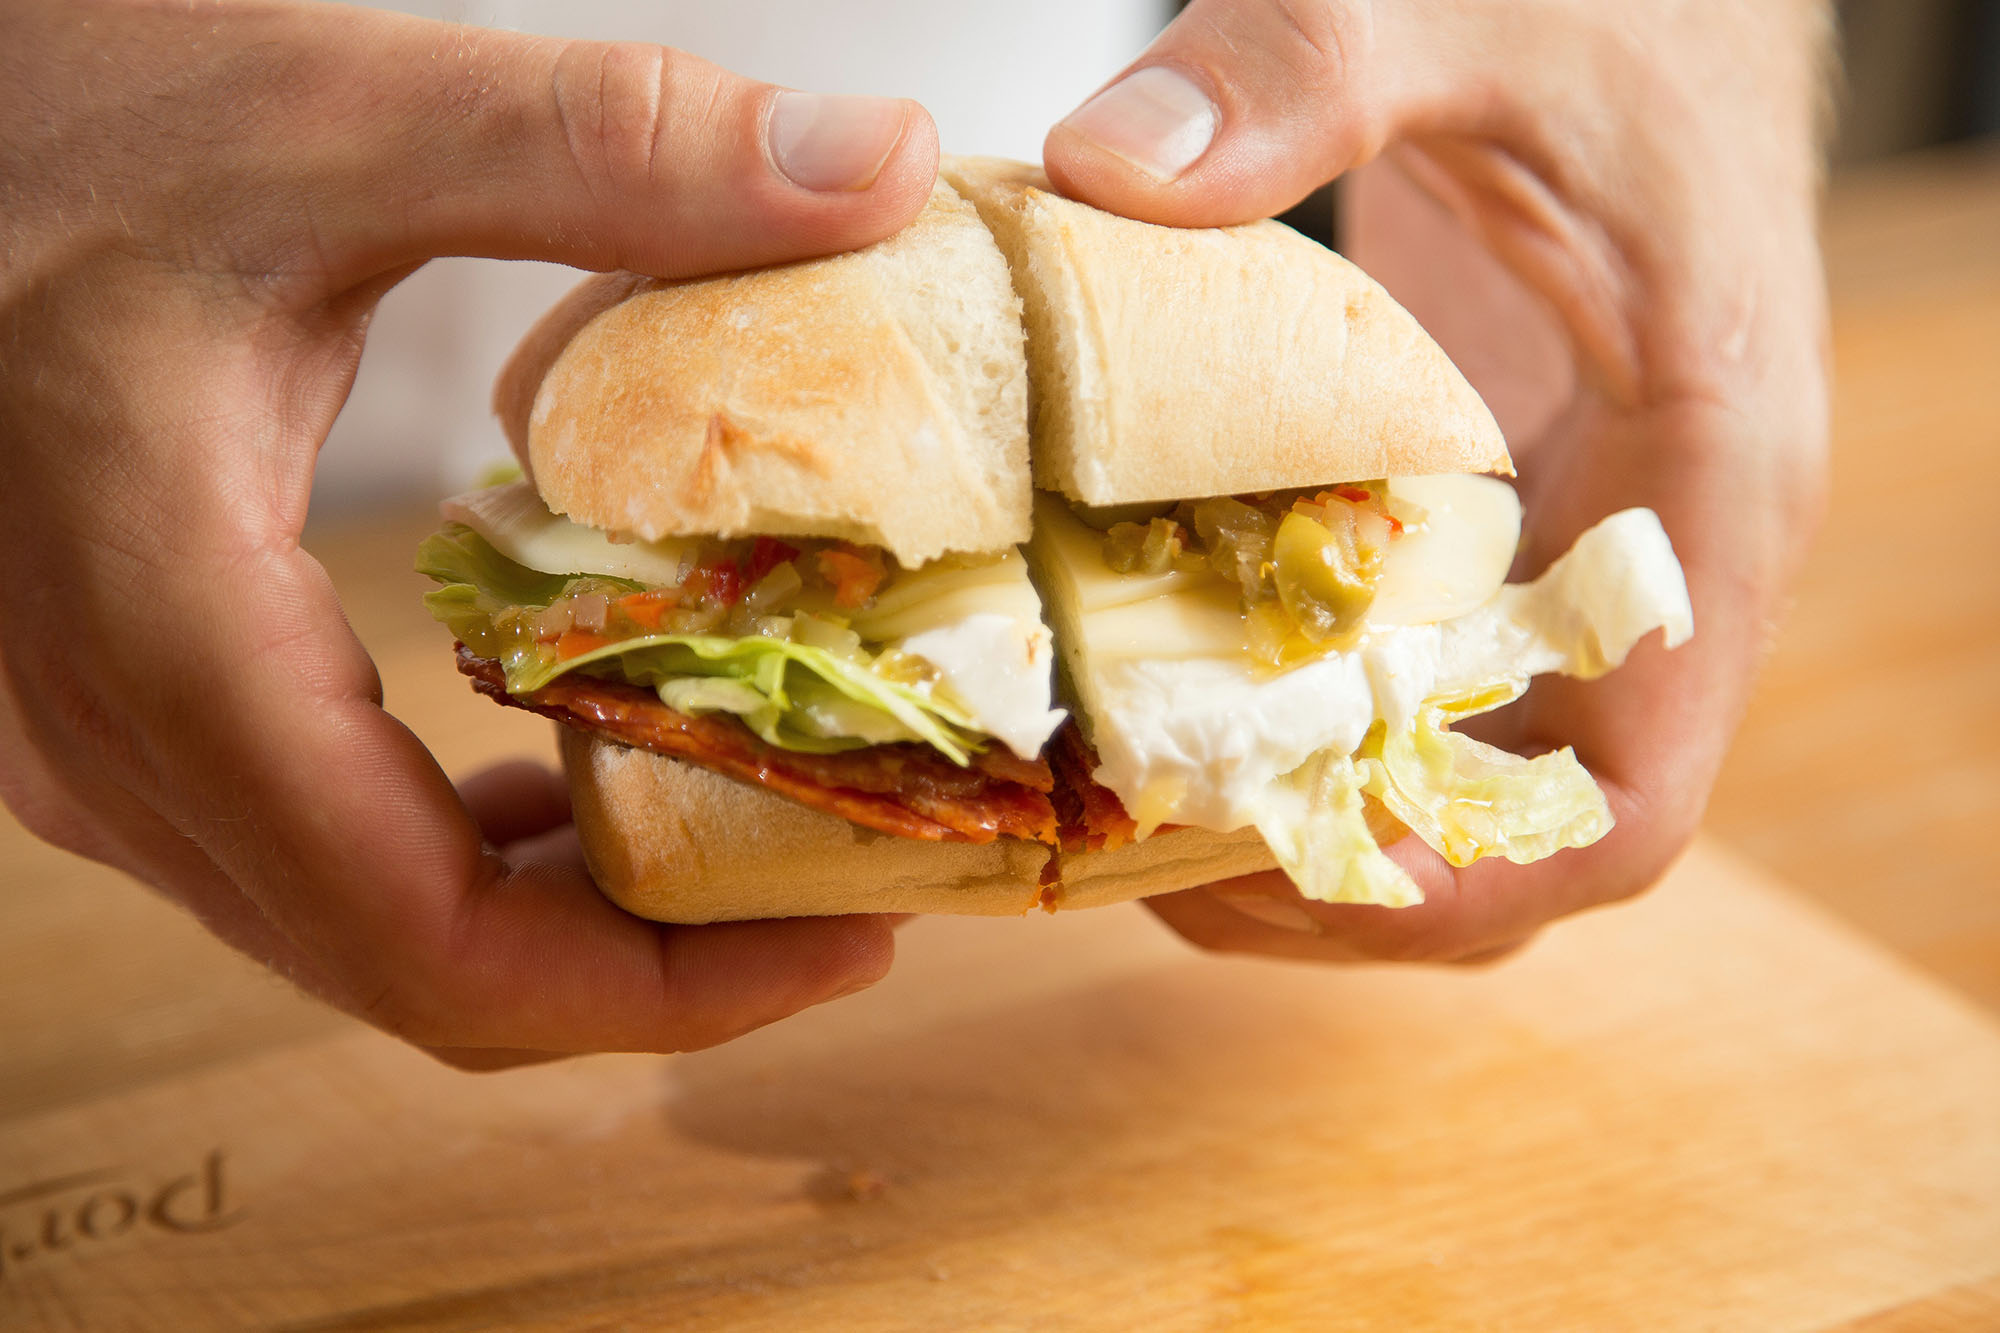 Sandwich-Muffaletta-Pepe-PorkShop-sml.jpg